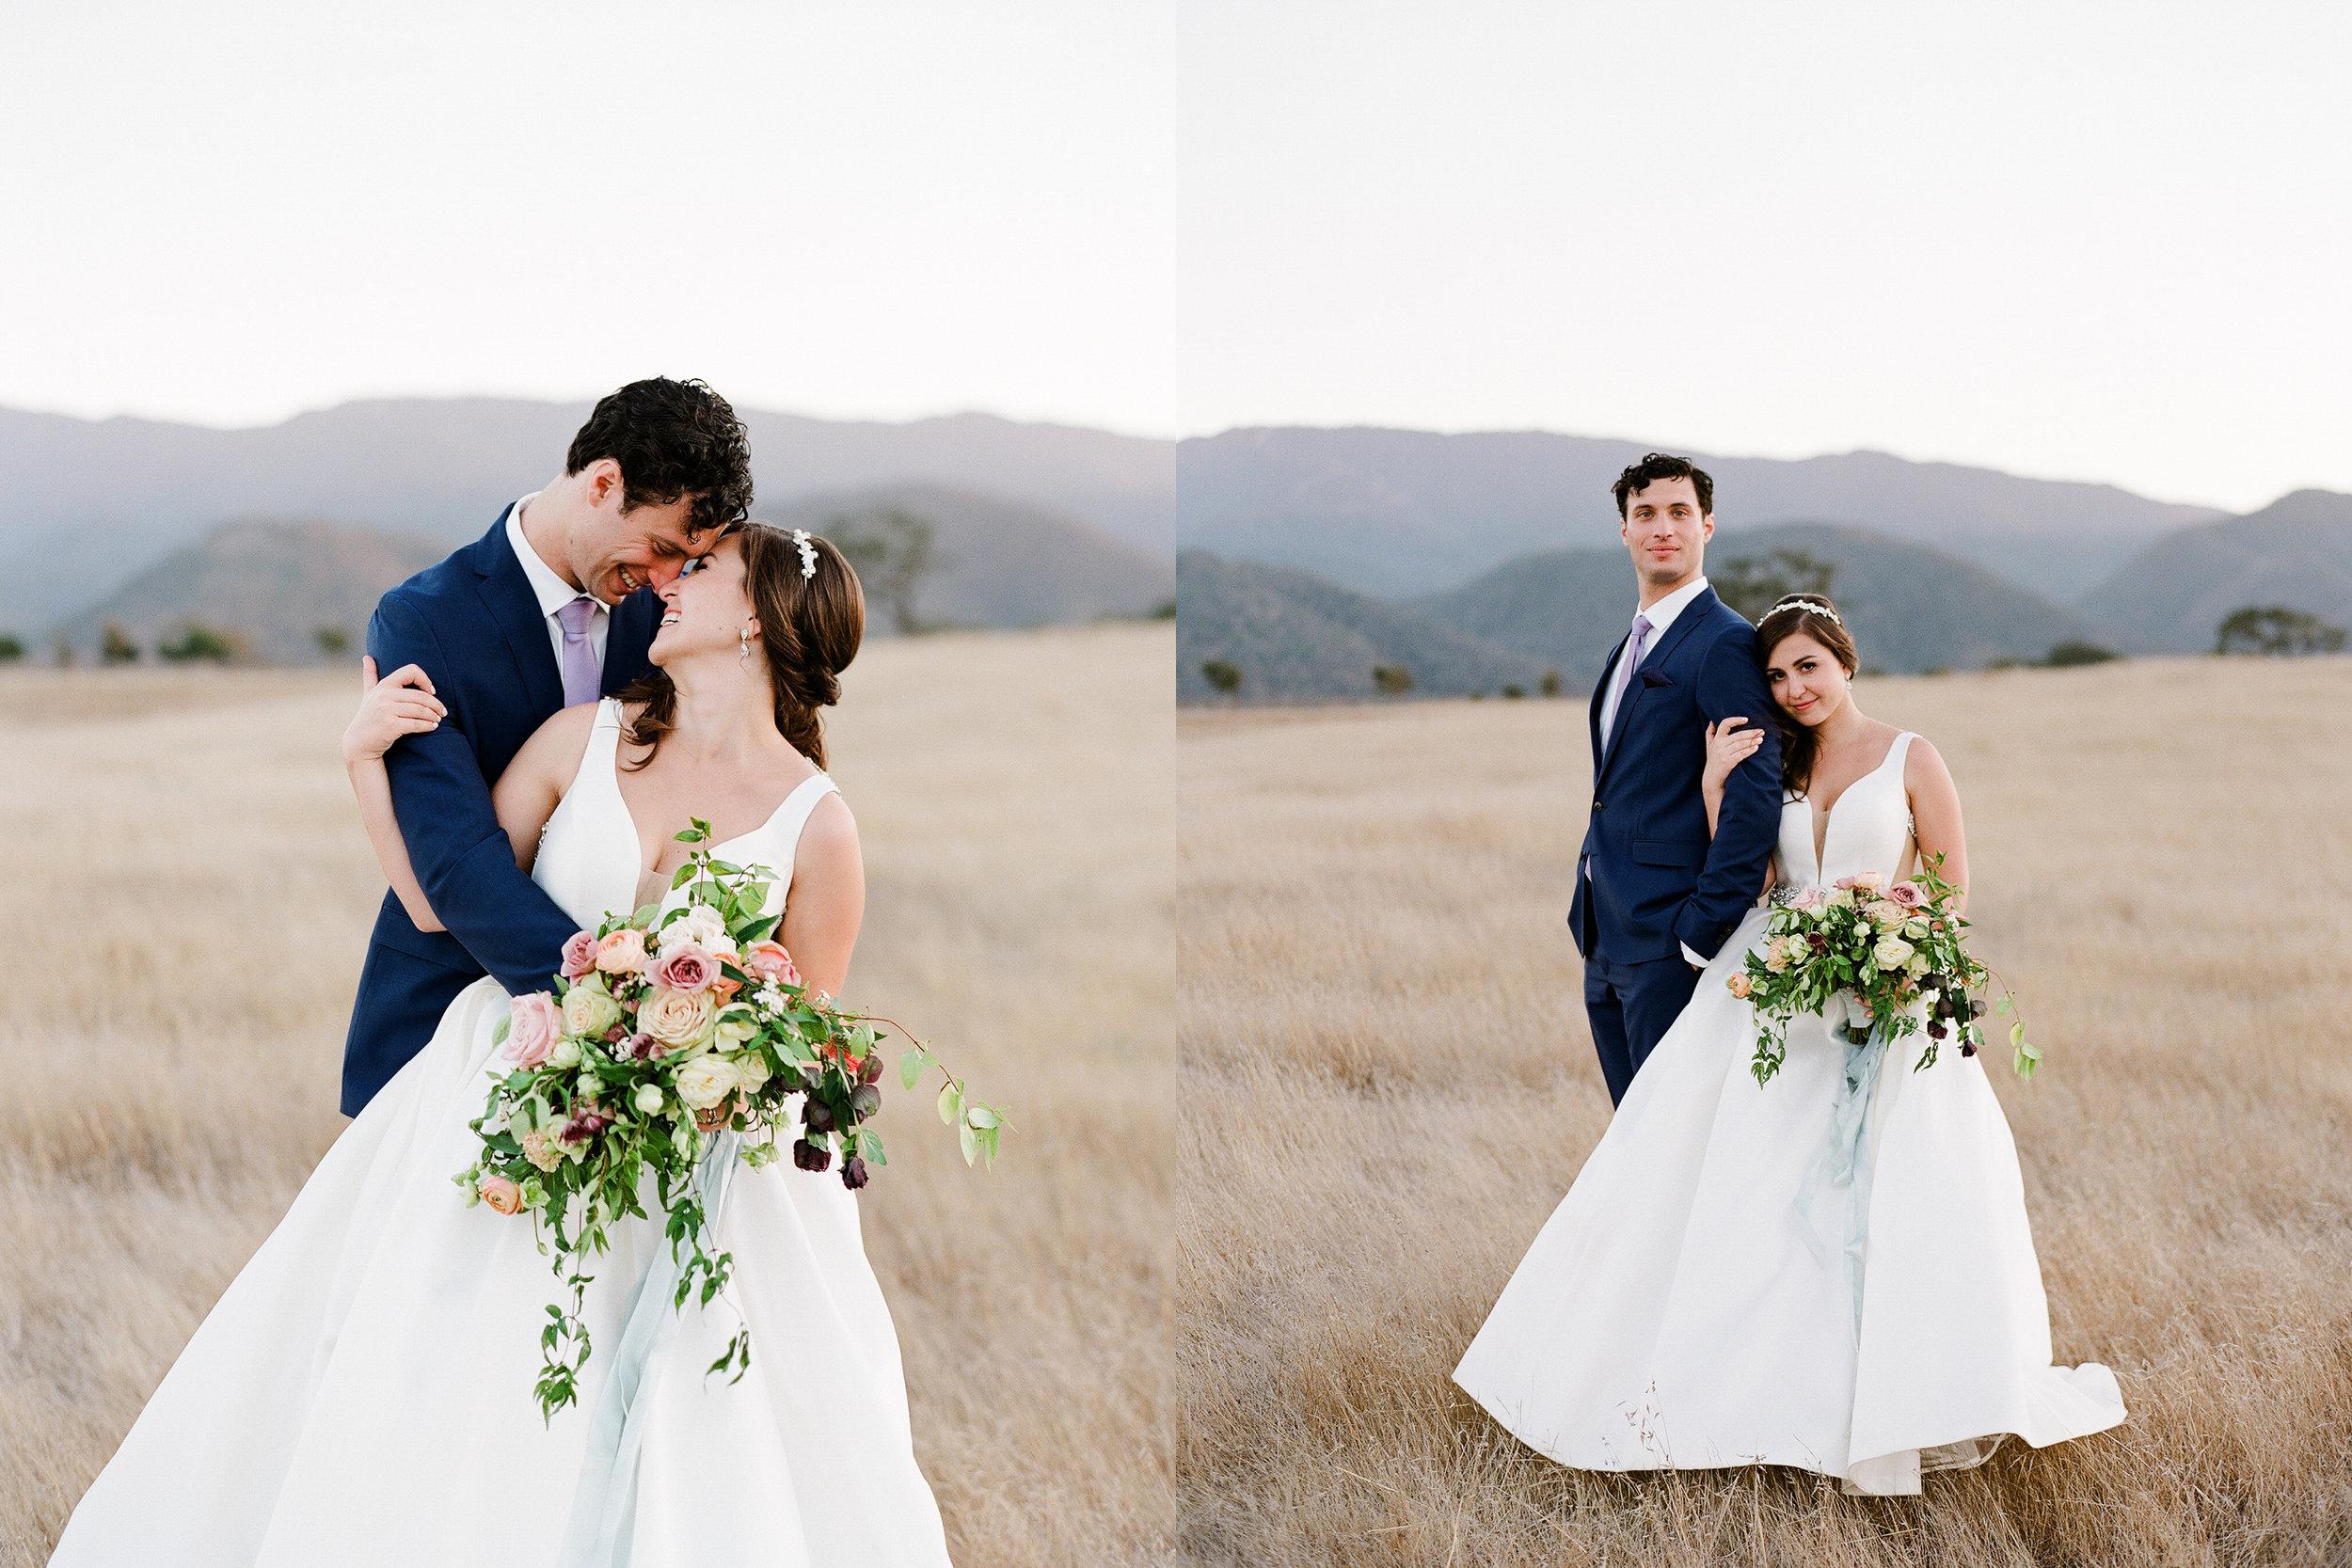 santa-barbara-elopement-elope-wedding-planner-planning-coordinator-day-of-intimate-event-design-kestrel-park-santa-ynez-english-country-estate-garden-castle (17).jpg